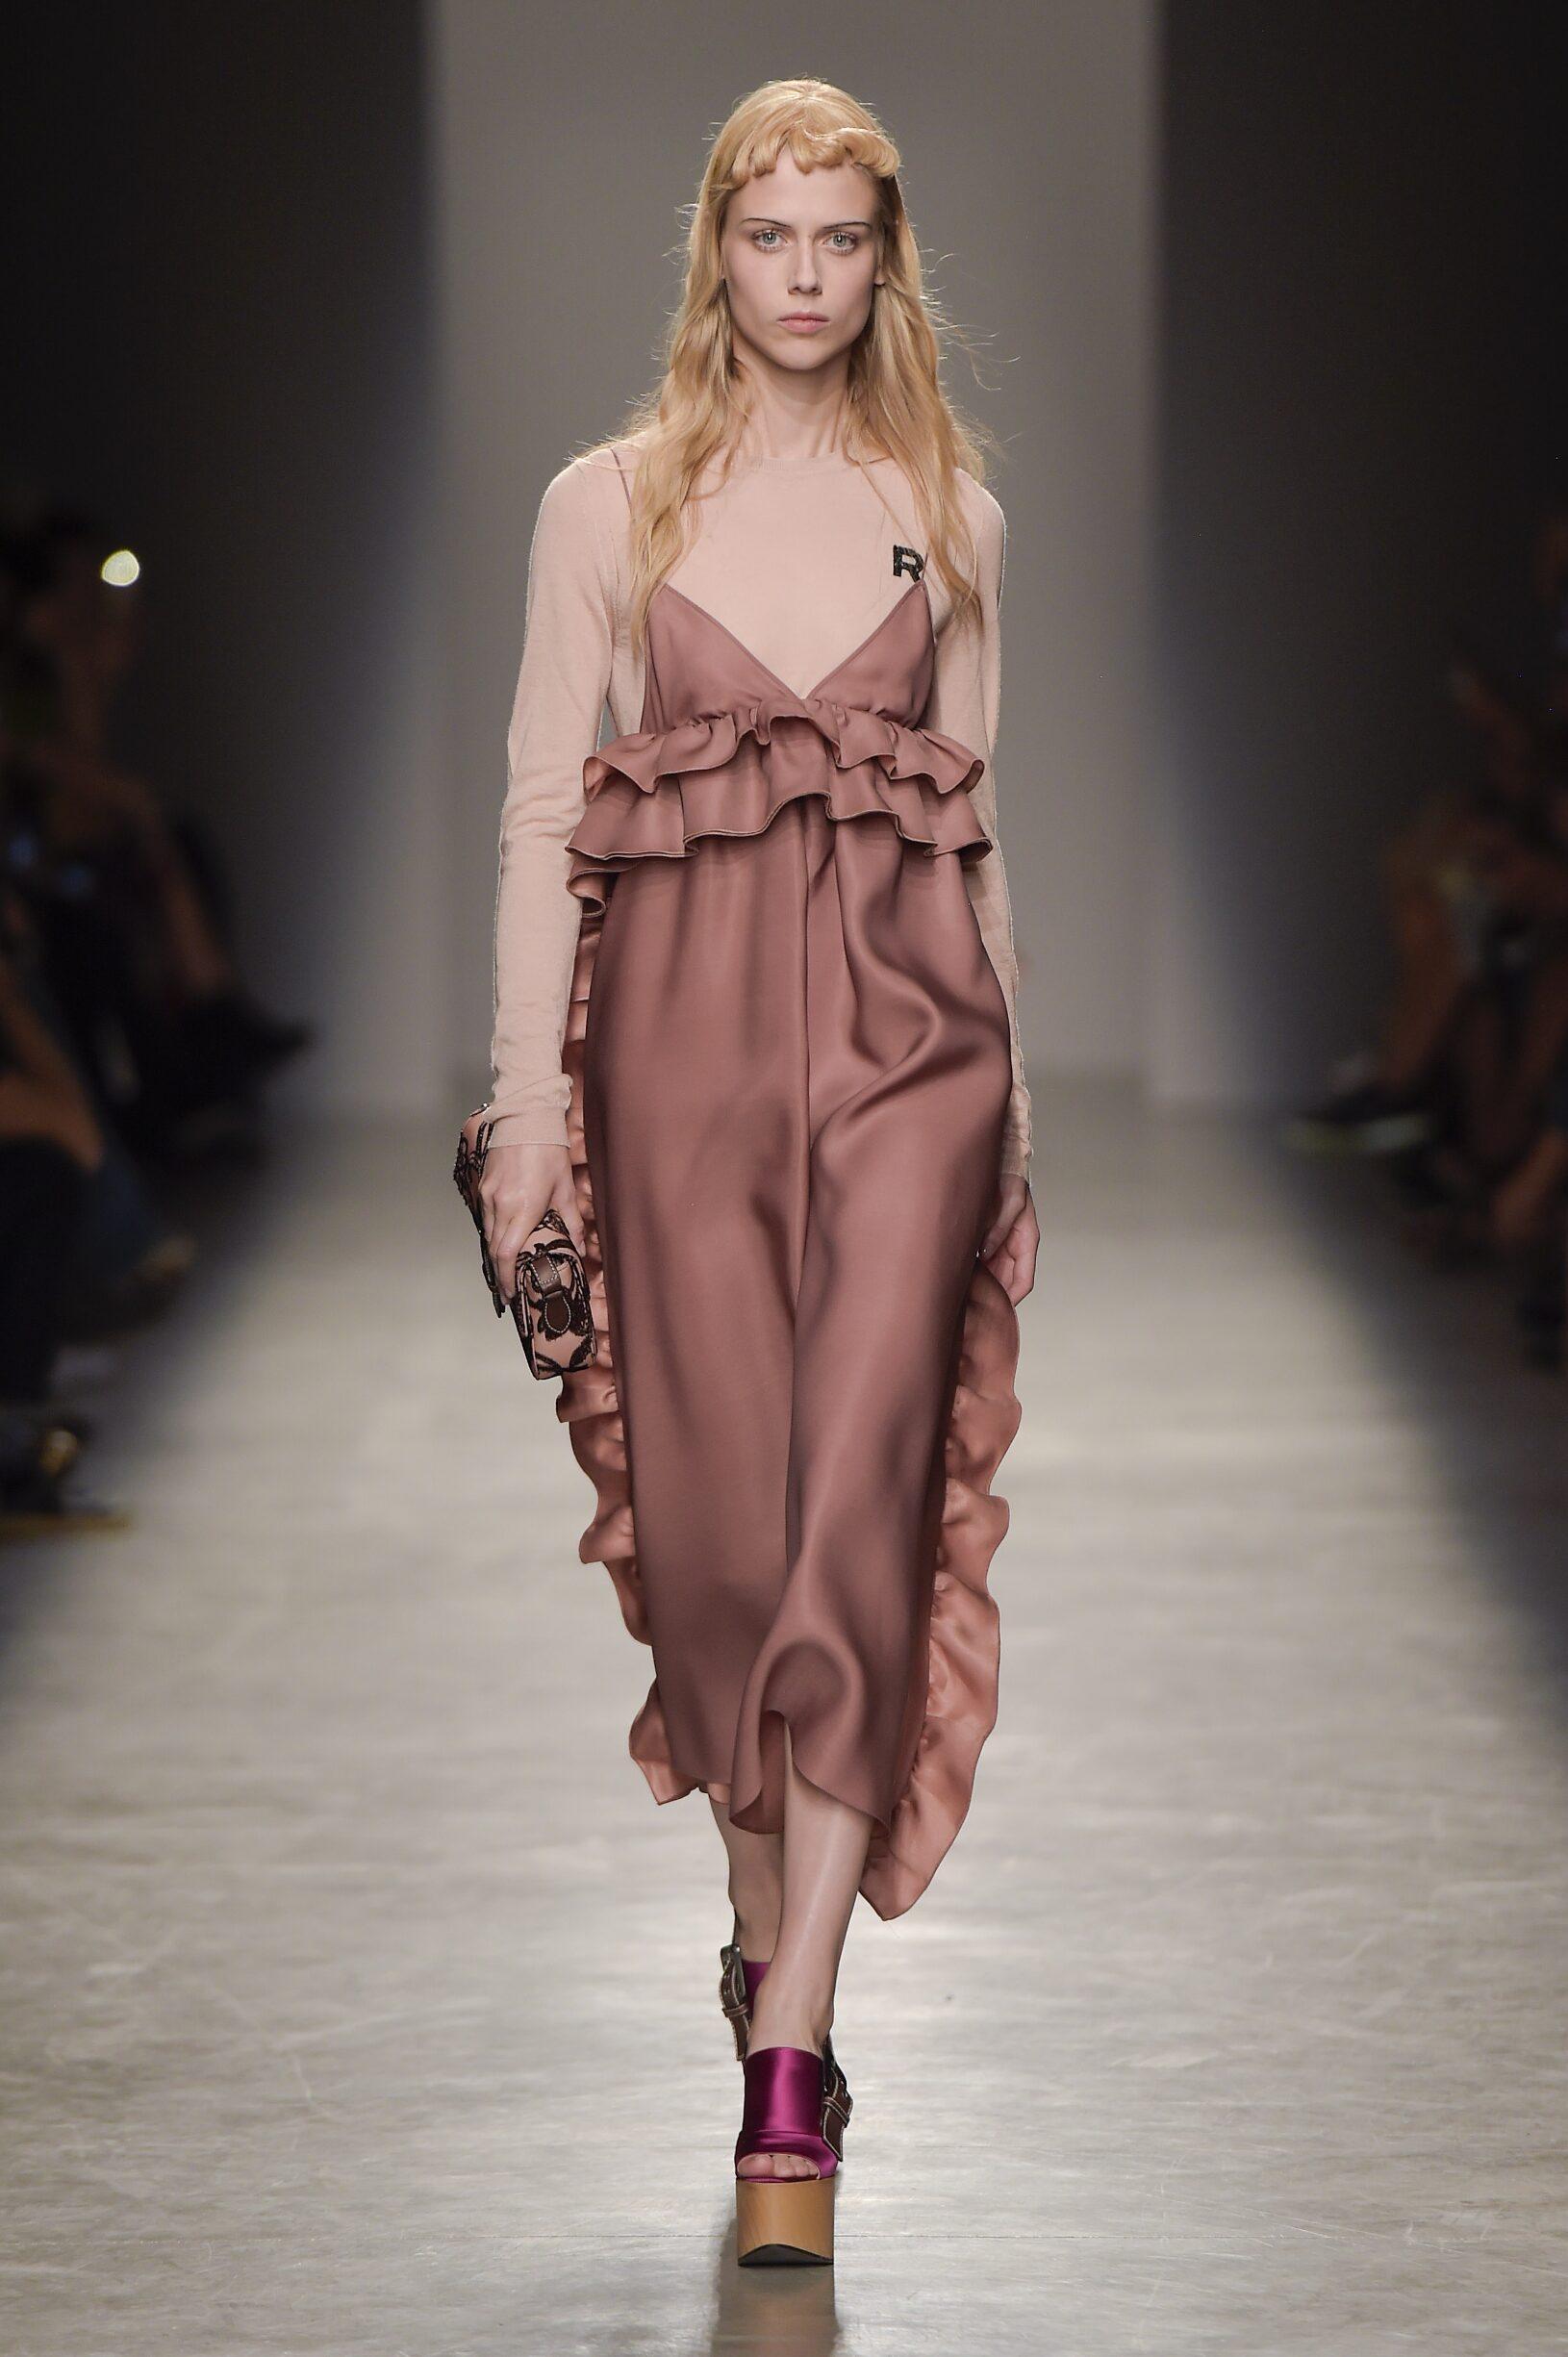 Fashion Model Rochas Catwalk